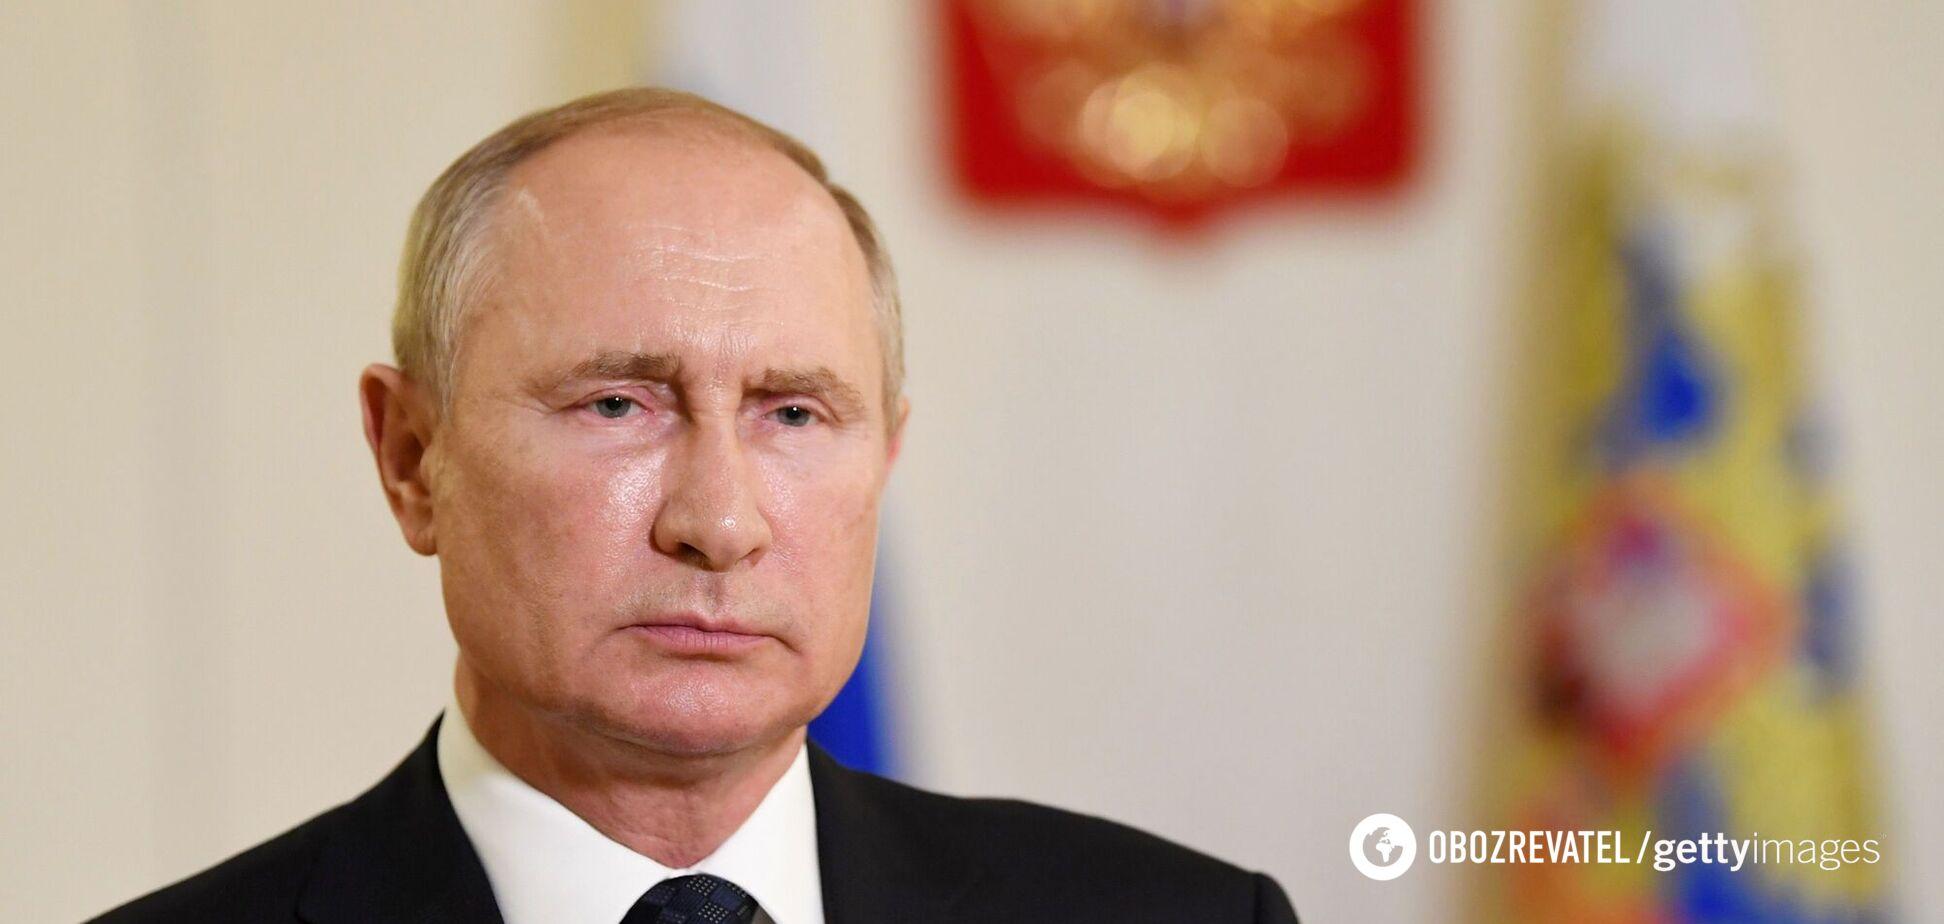 Путин предложил Госдуме разработать законопроект о запрете сравнения СССР с нацистской Германией